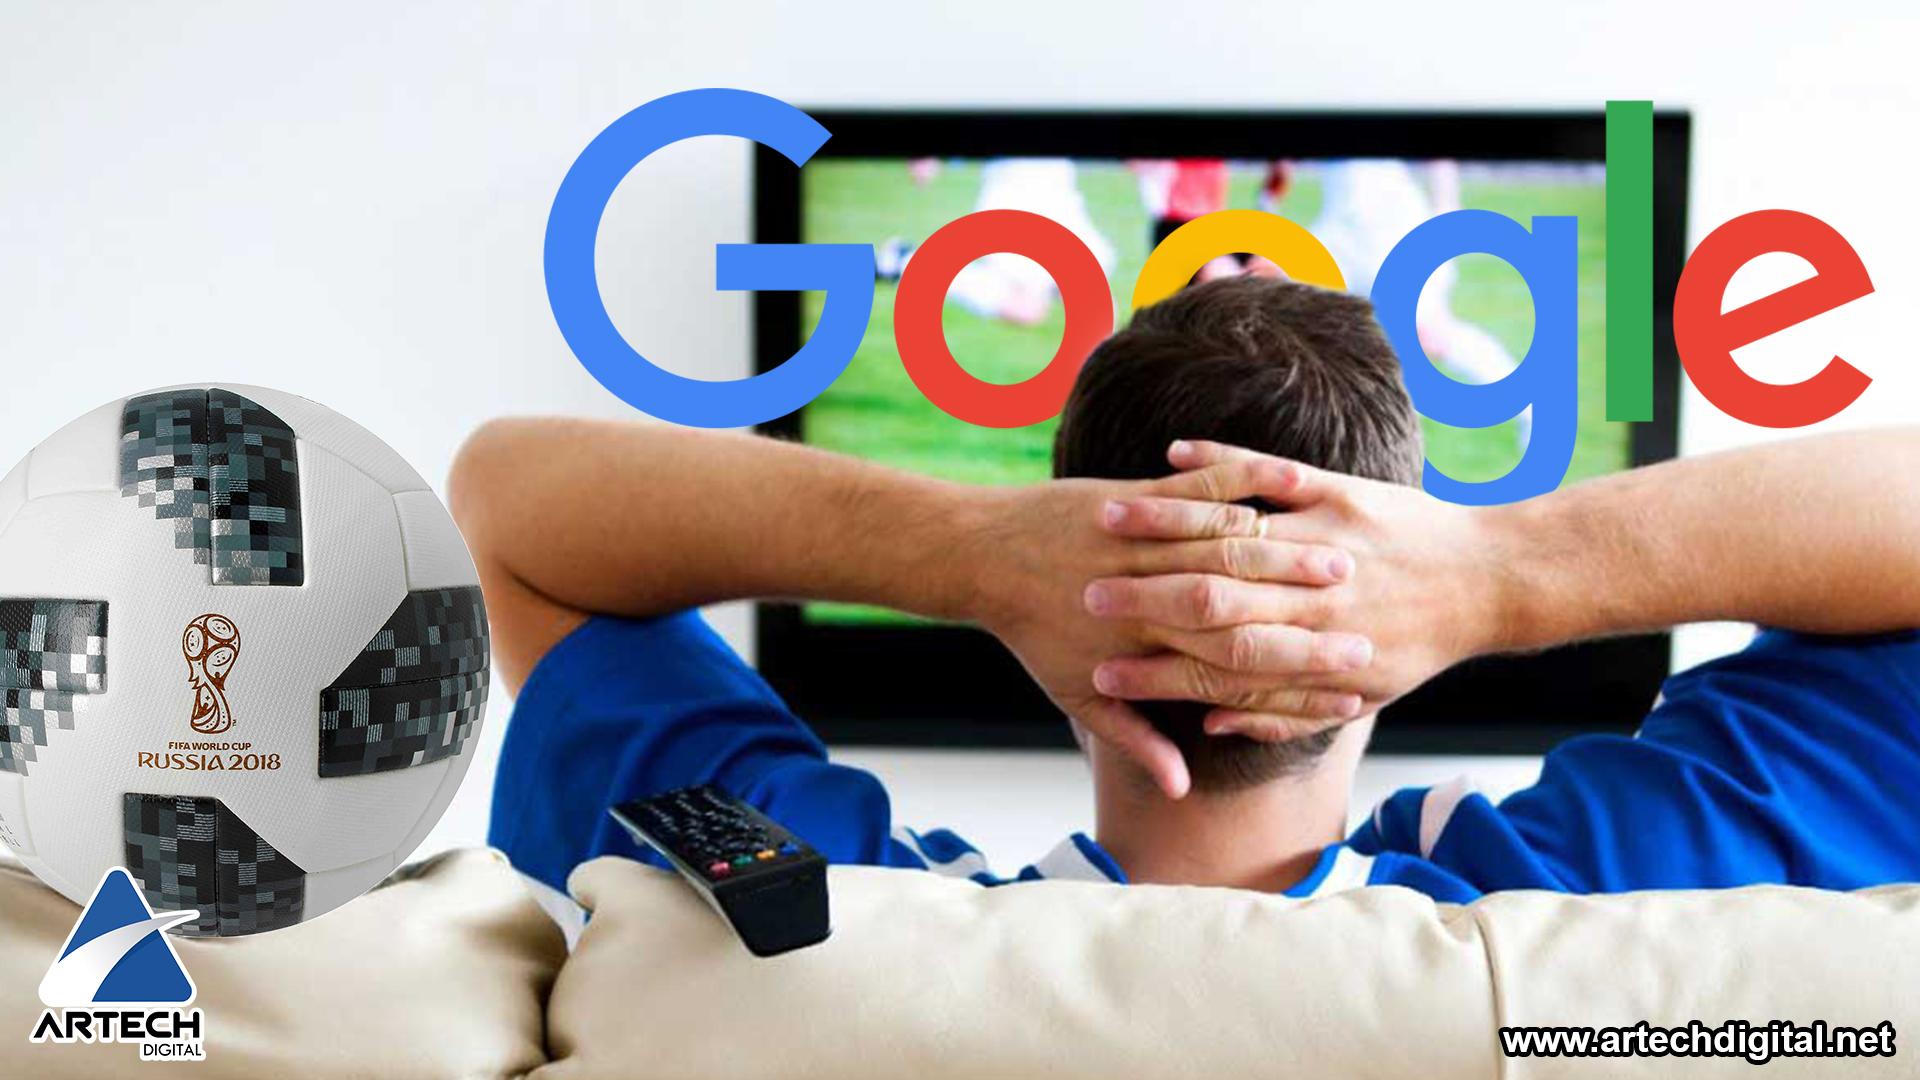 Sigue la fiebre del Mundial Rusia 2018 con Google